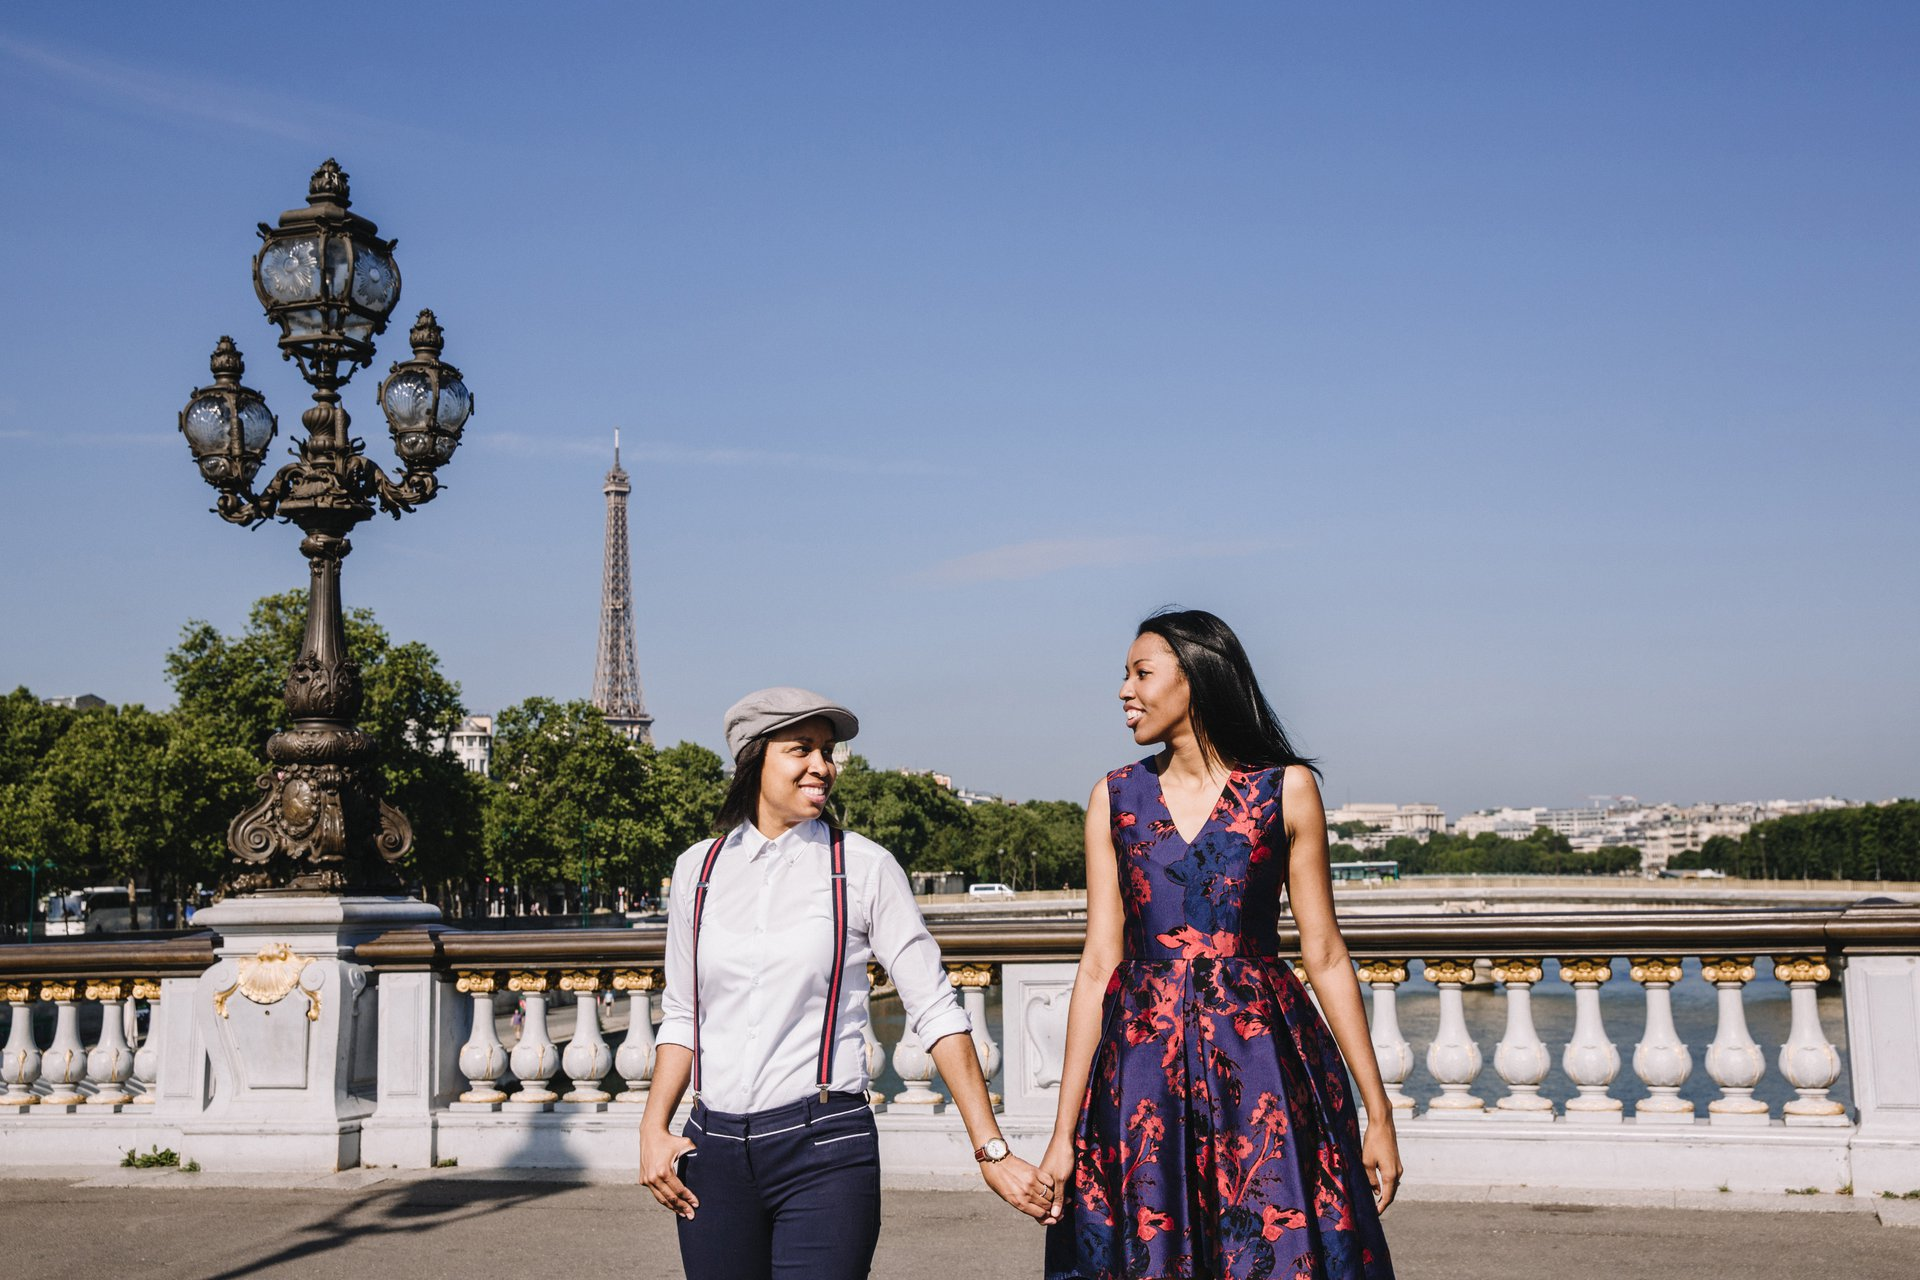 Flytographer Travel Story - Parisian Engagement Session